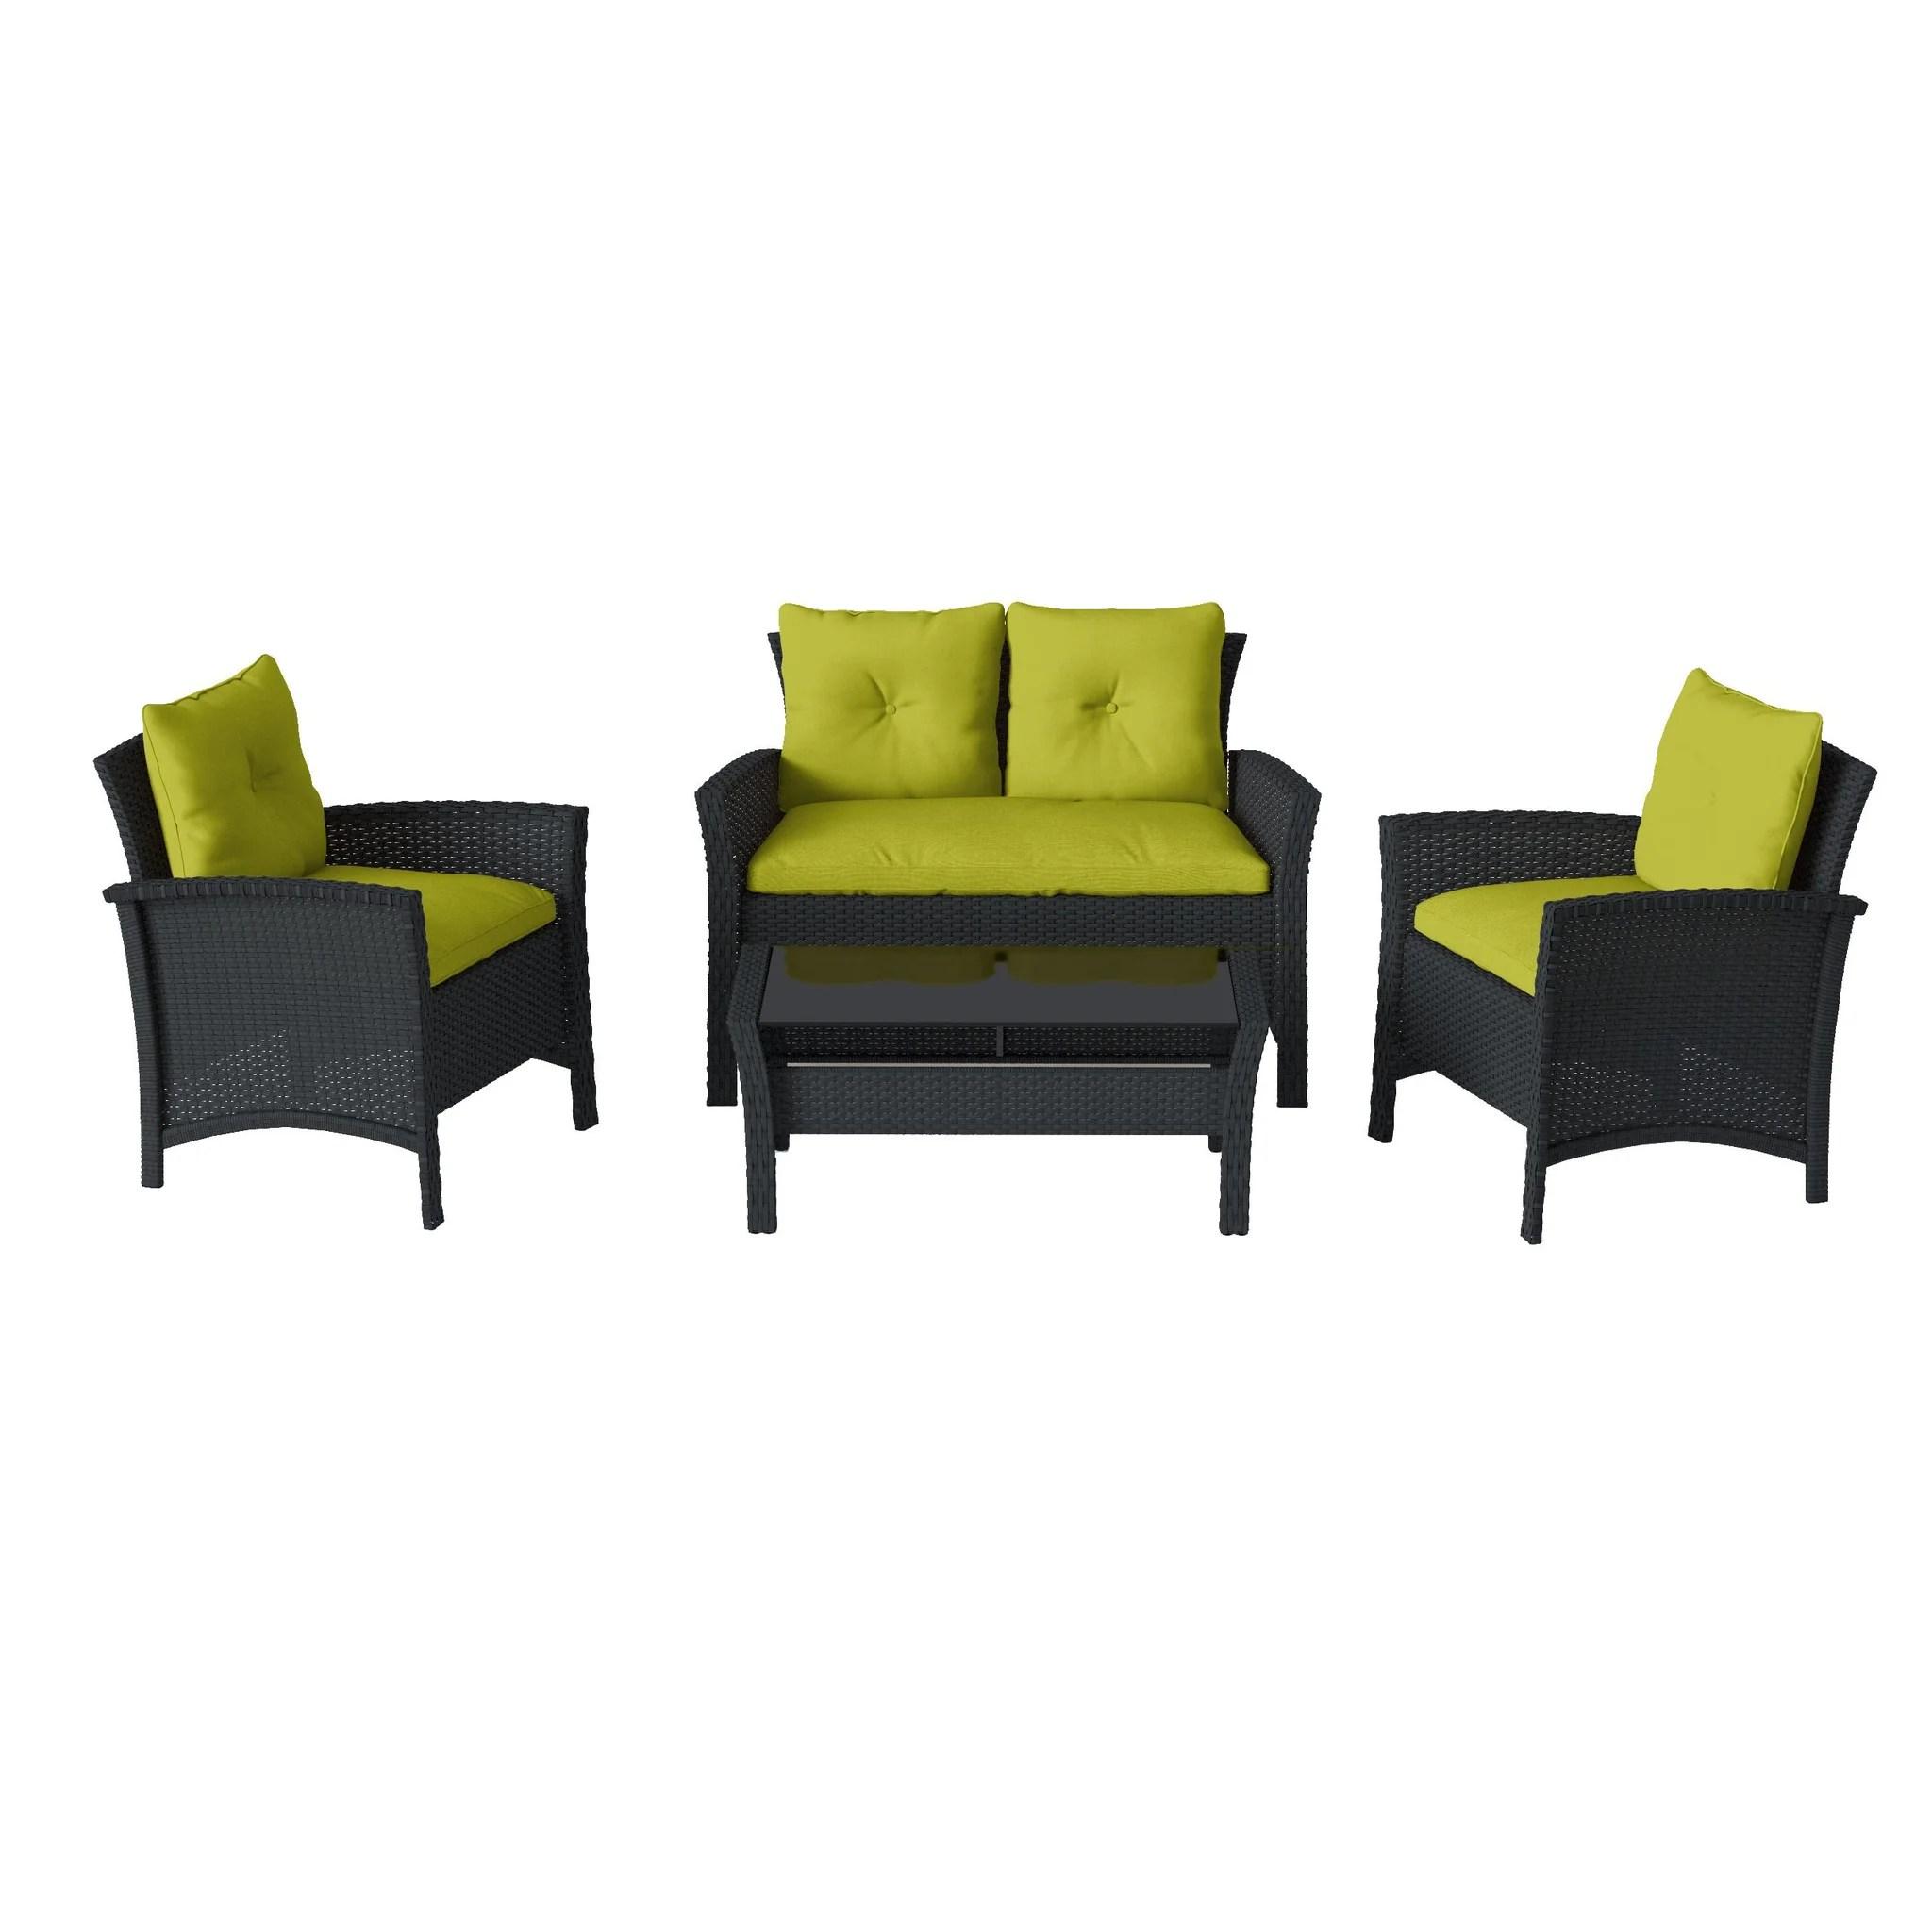 cascade black resin rattan wicker patio set with cushions 4pc